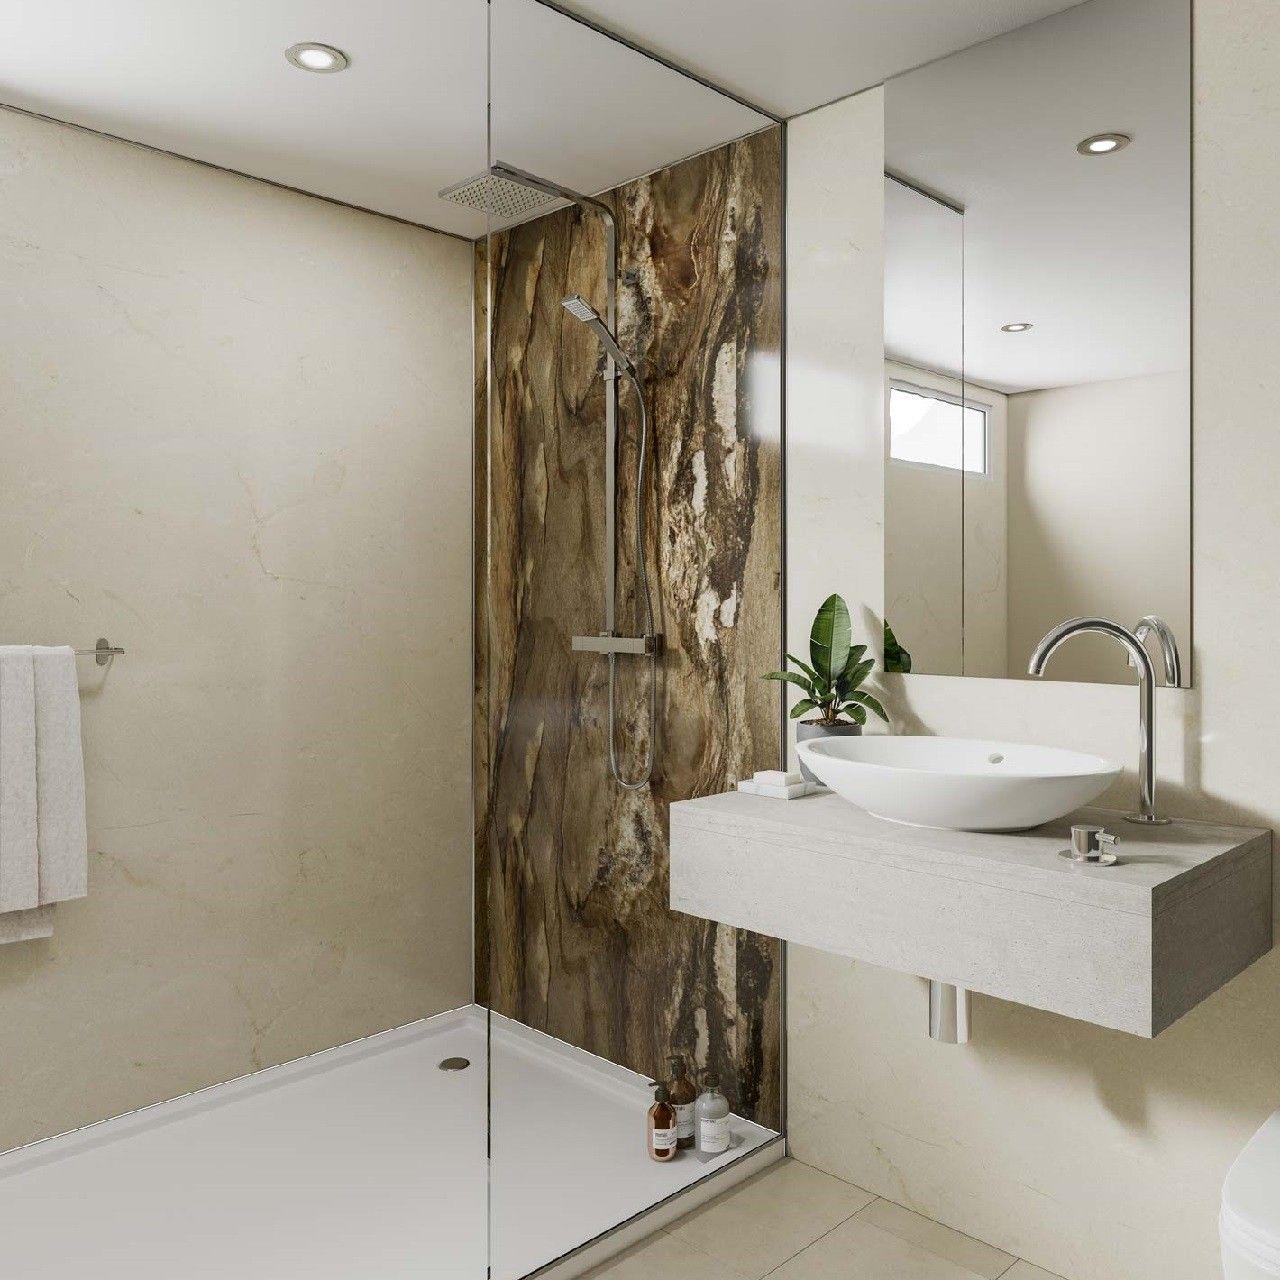 Multipanel Linda Barker Dolce Macchiato 2400mm X 1200mm Hydro Lock Tongue Groove Bathroom Wall Panel Bathroom Wall Panels Shower Wall Panels Amazing Bathrooms